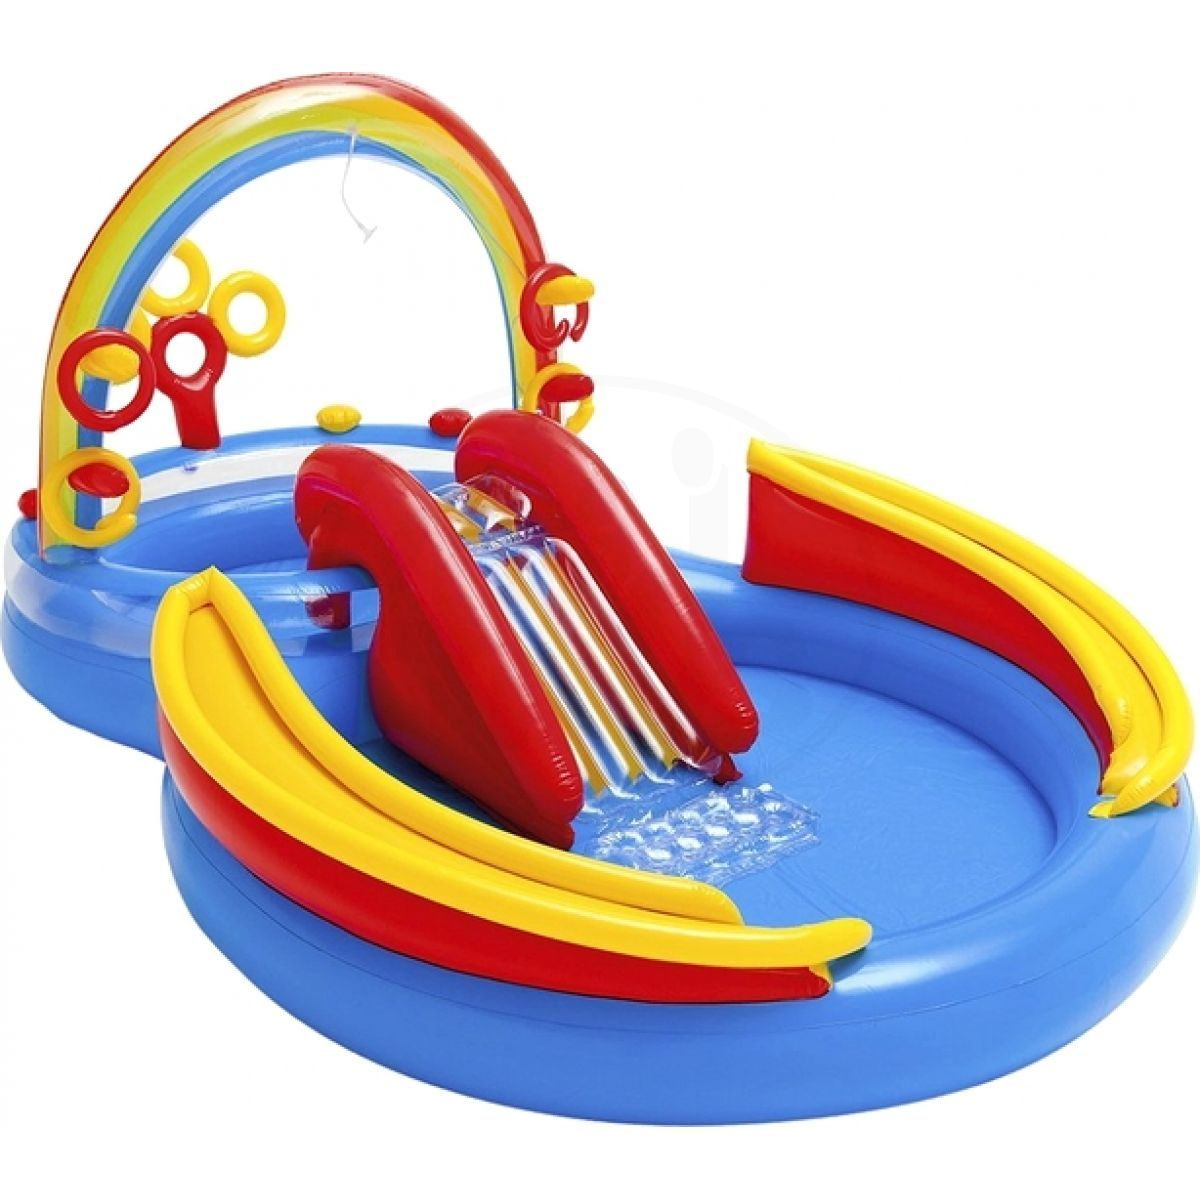 INTEX 57453 Rainbow Ring Play Center 297x193x135 cm